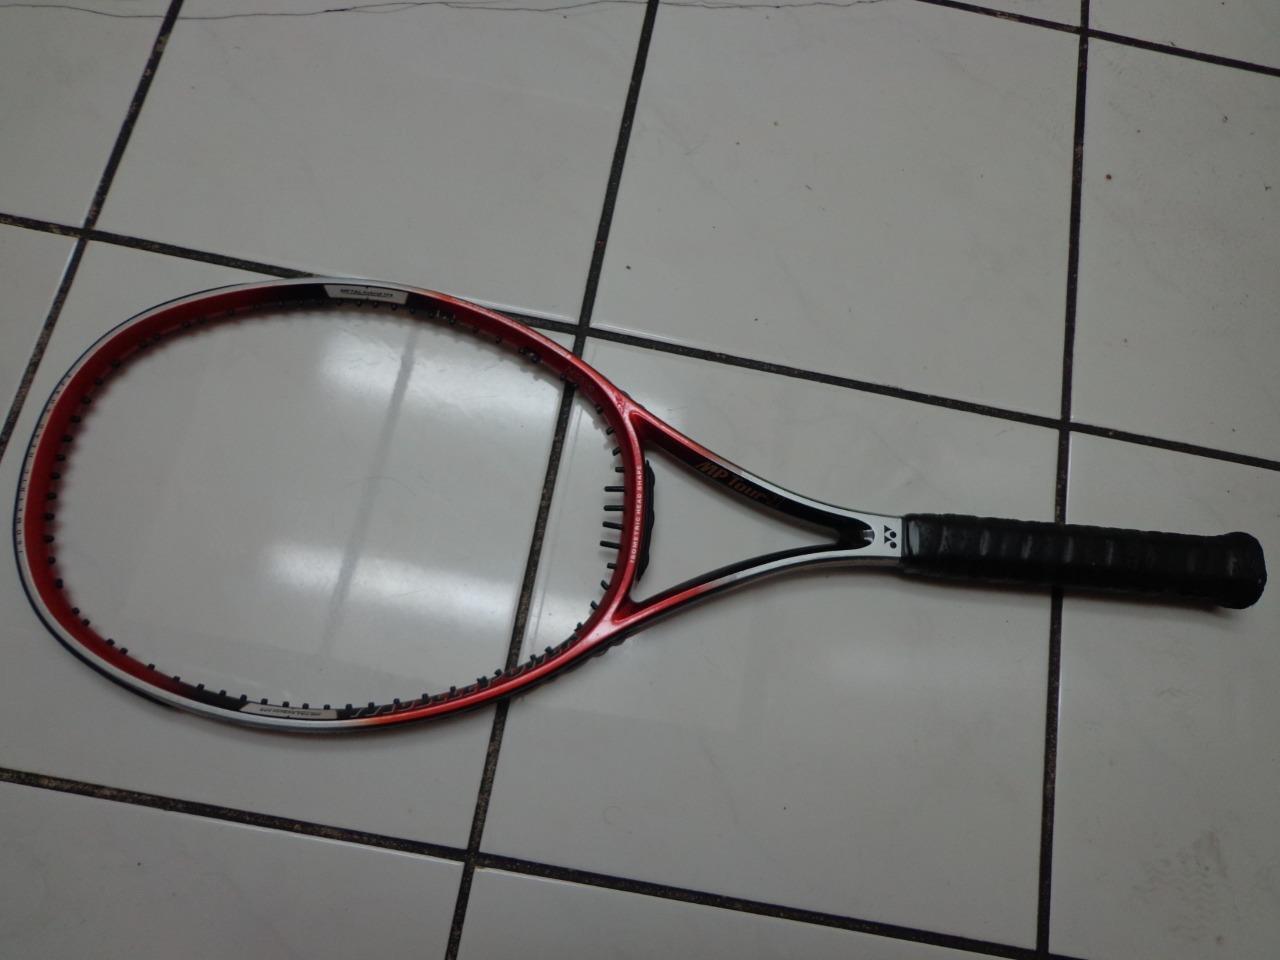 Yonex MP Tour 1 90 cabeza 4 1 2 Grip Tenis Raqueta